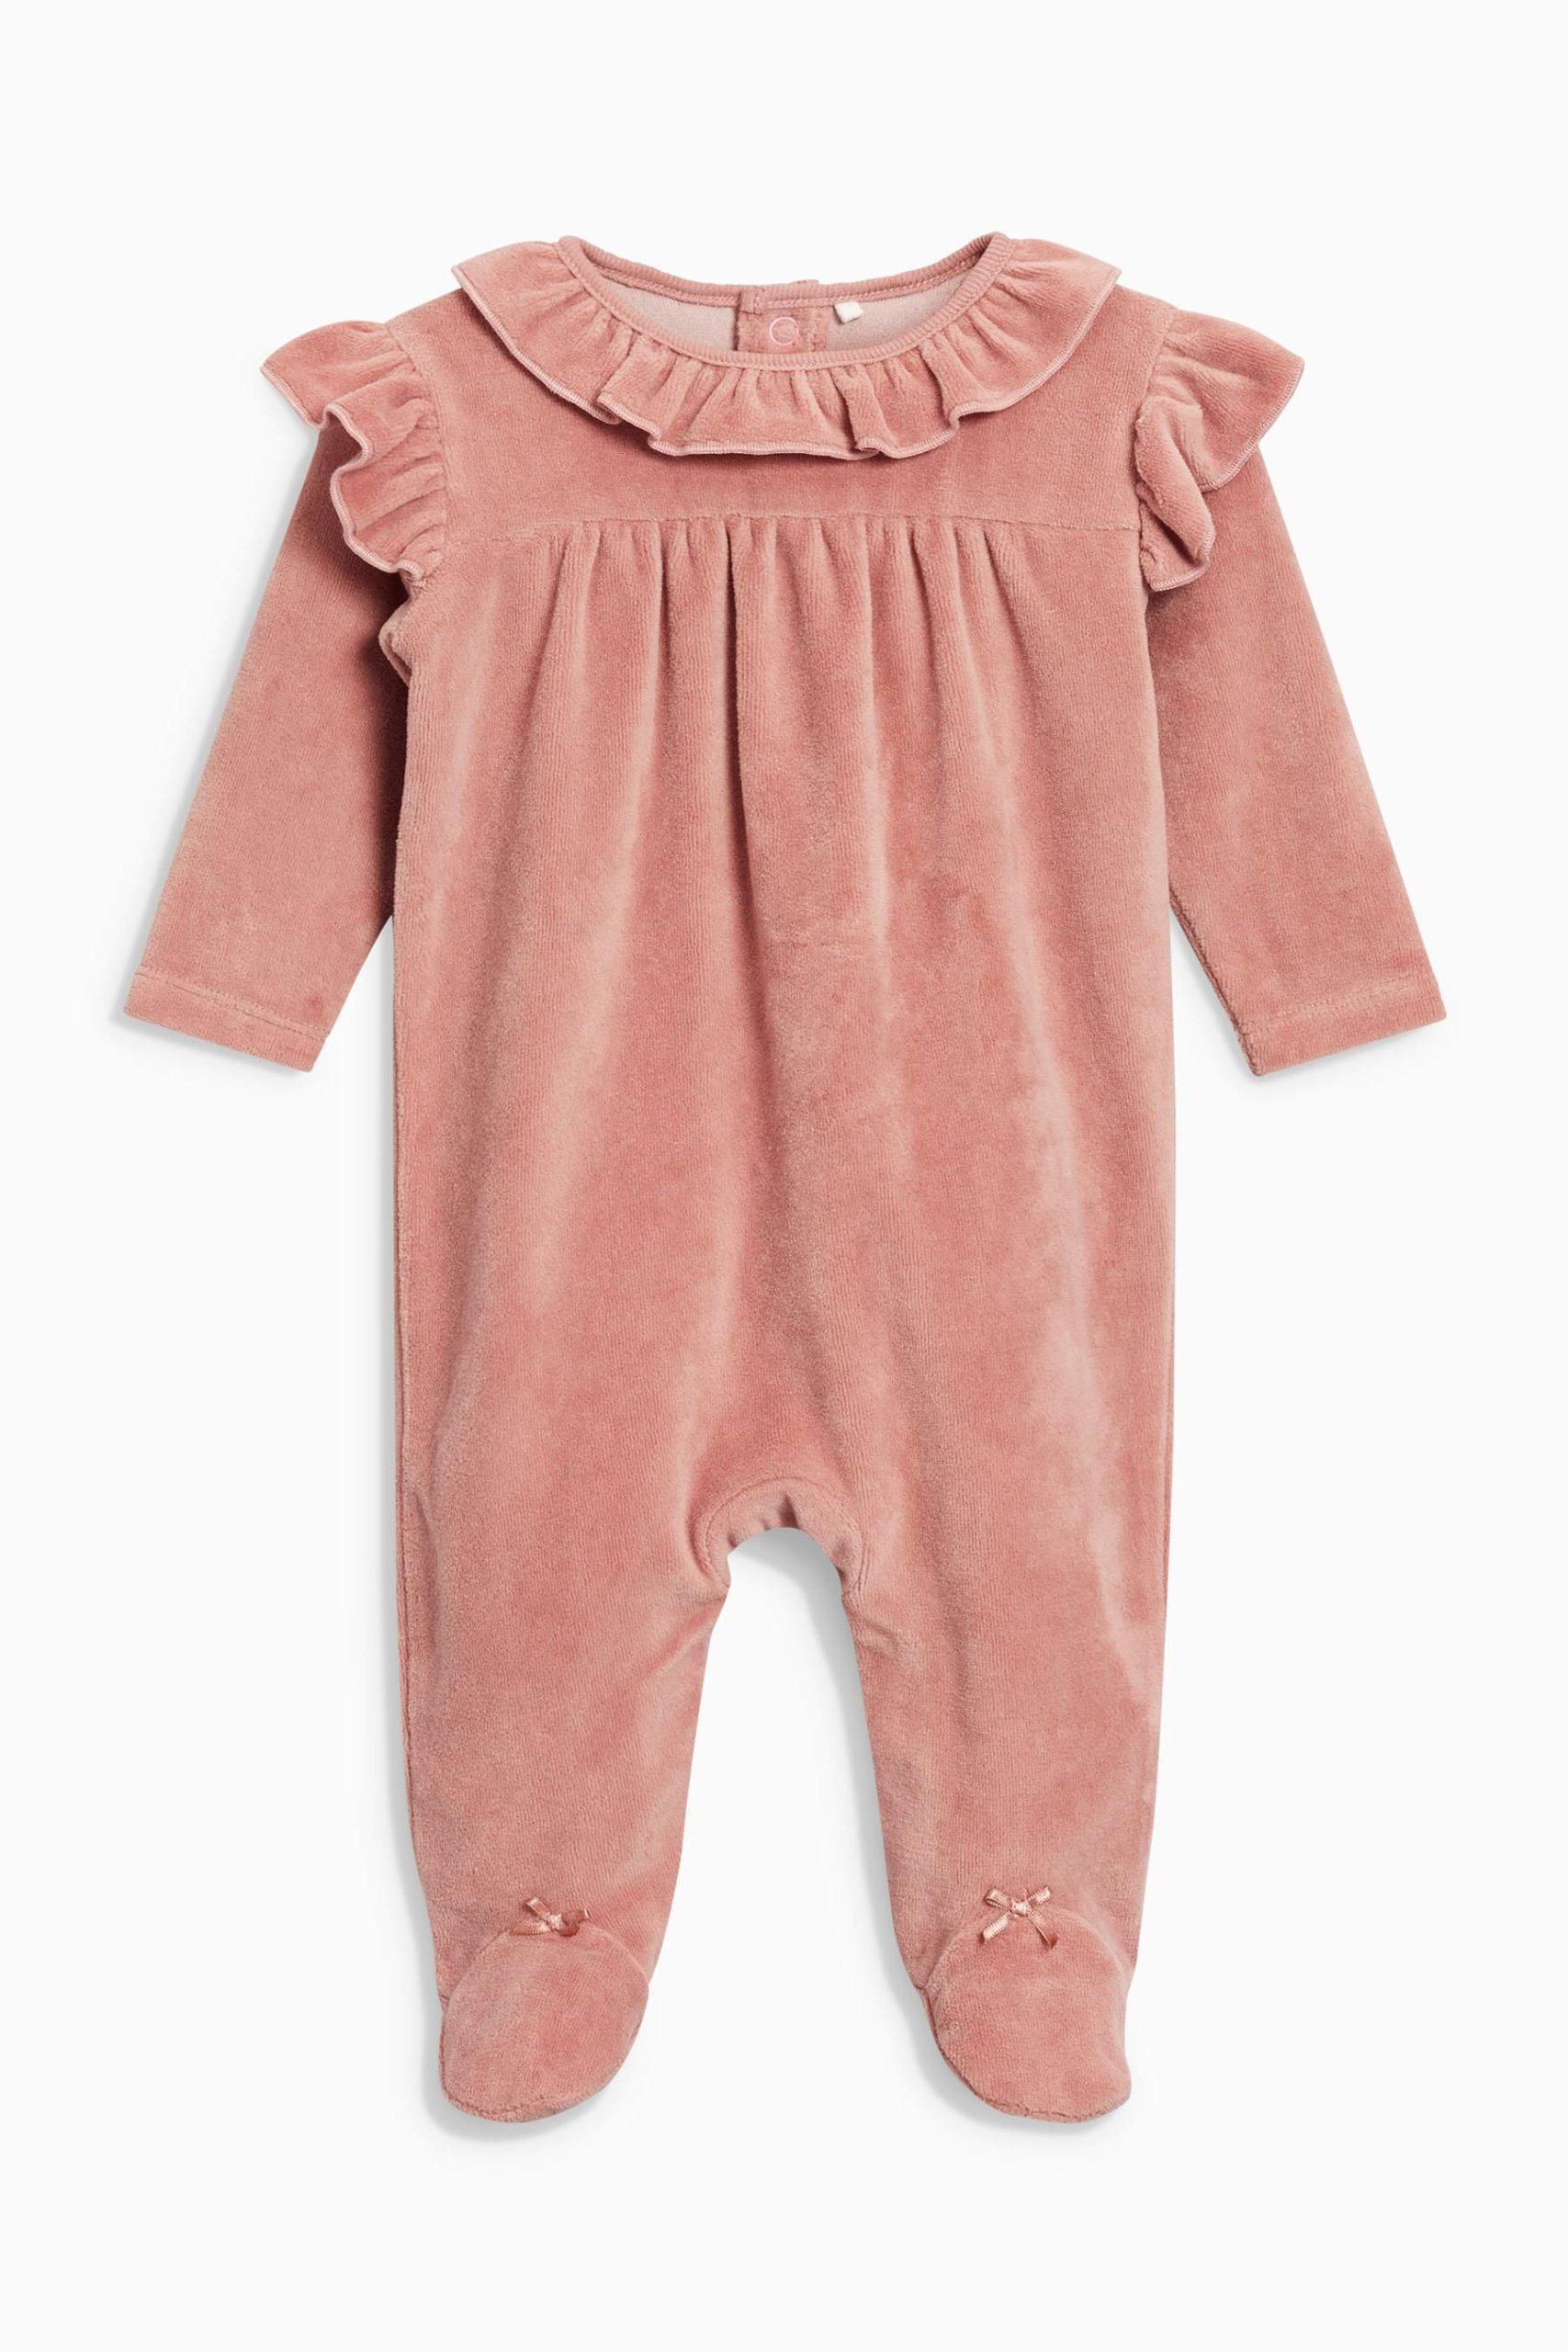 Pink frill velour sleepsuit